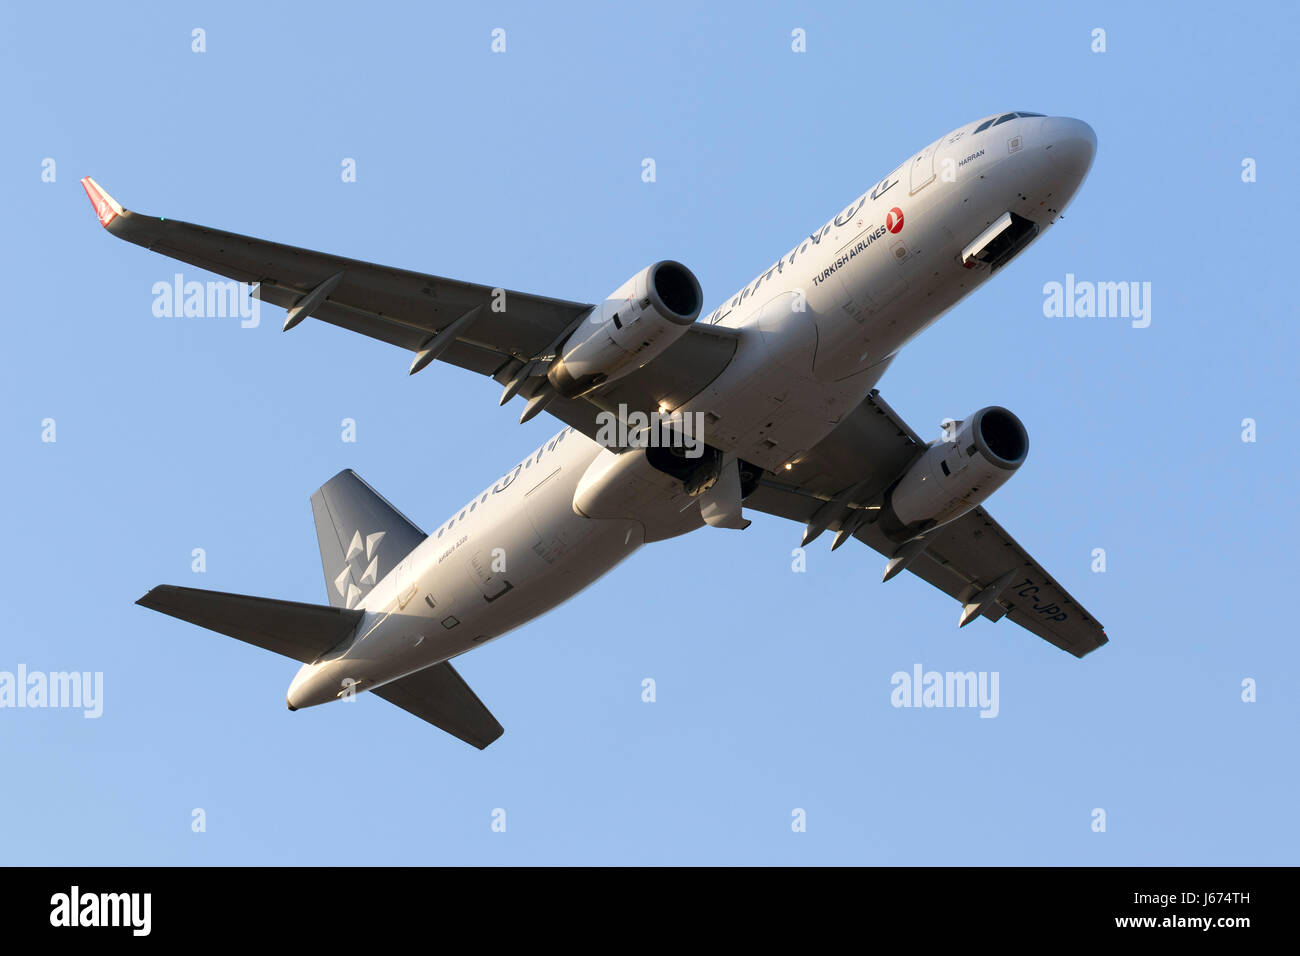 Star Alliance (Turkish Airlines) Airbus A320-232 [TC-JPP] in partenza da pista 13 in serata. Immagini Stock